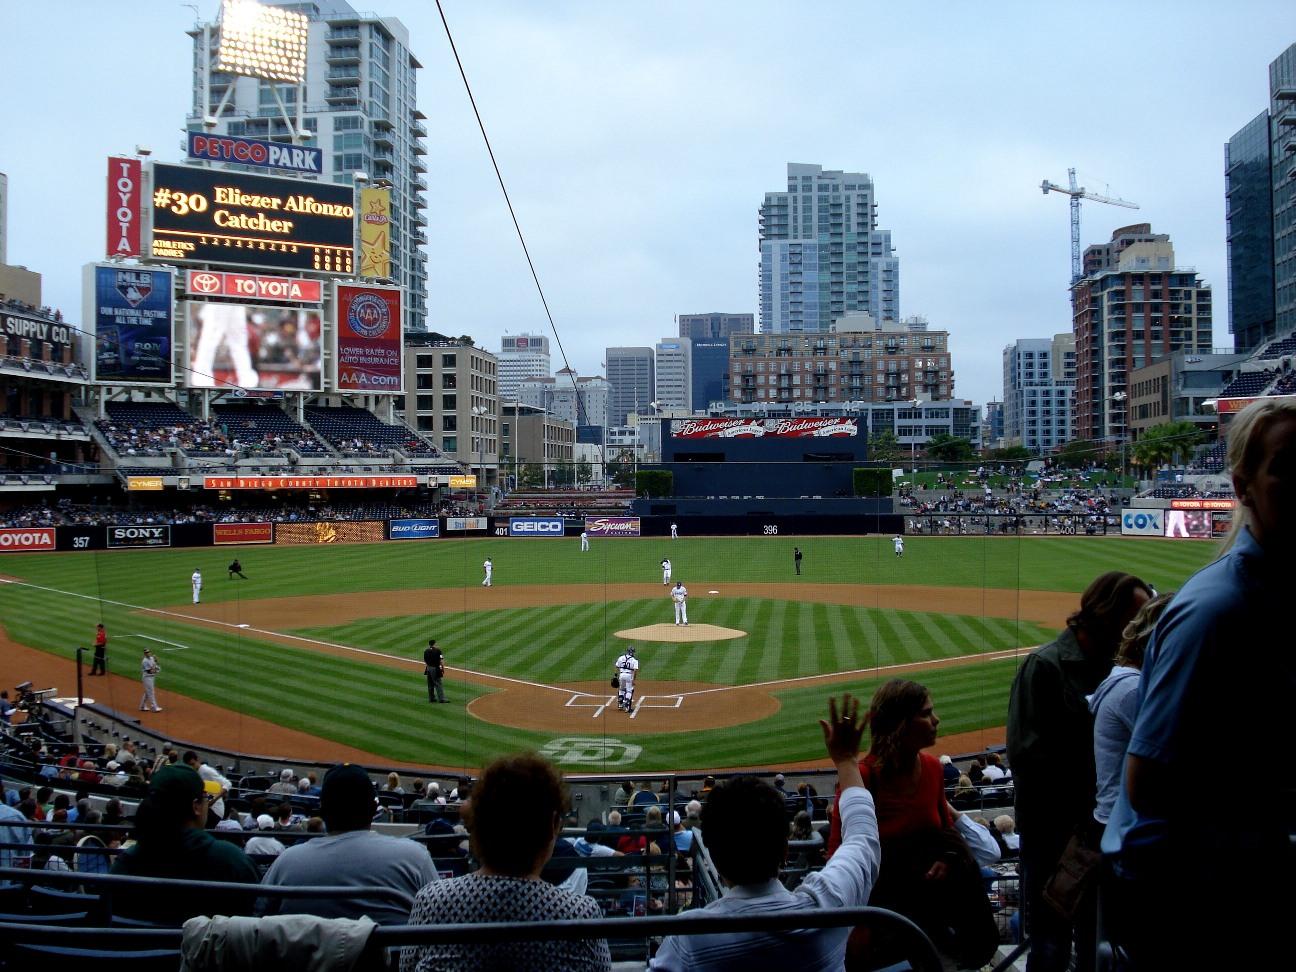 Let's Go Oakland! @ Petco Park